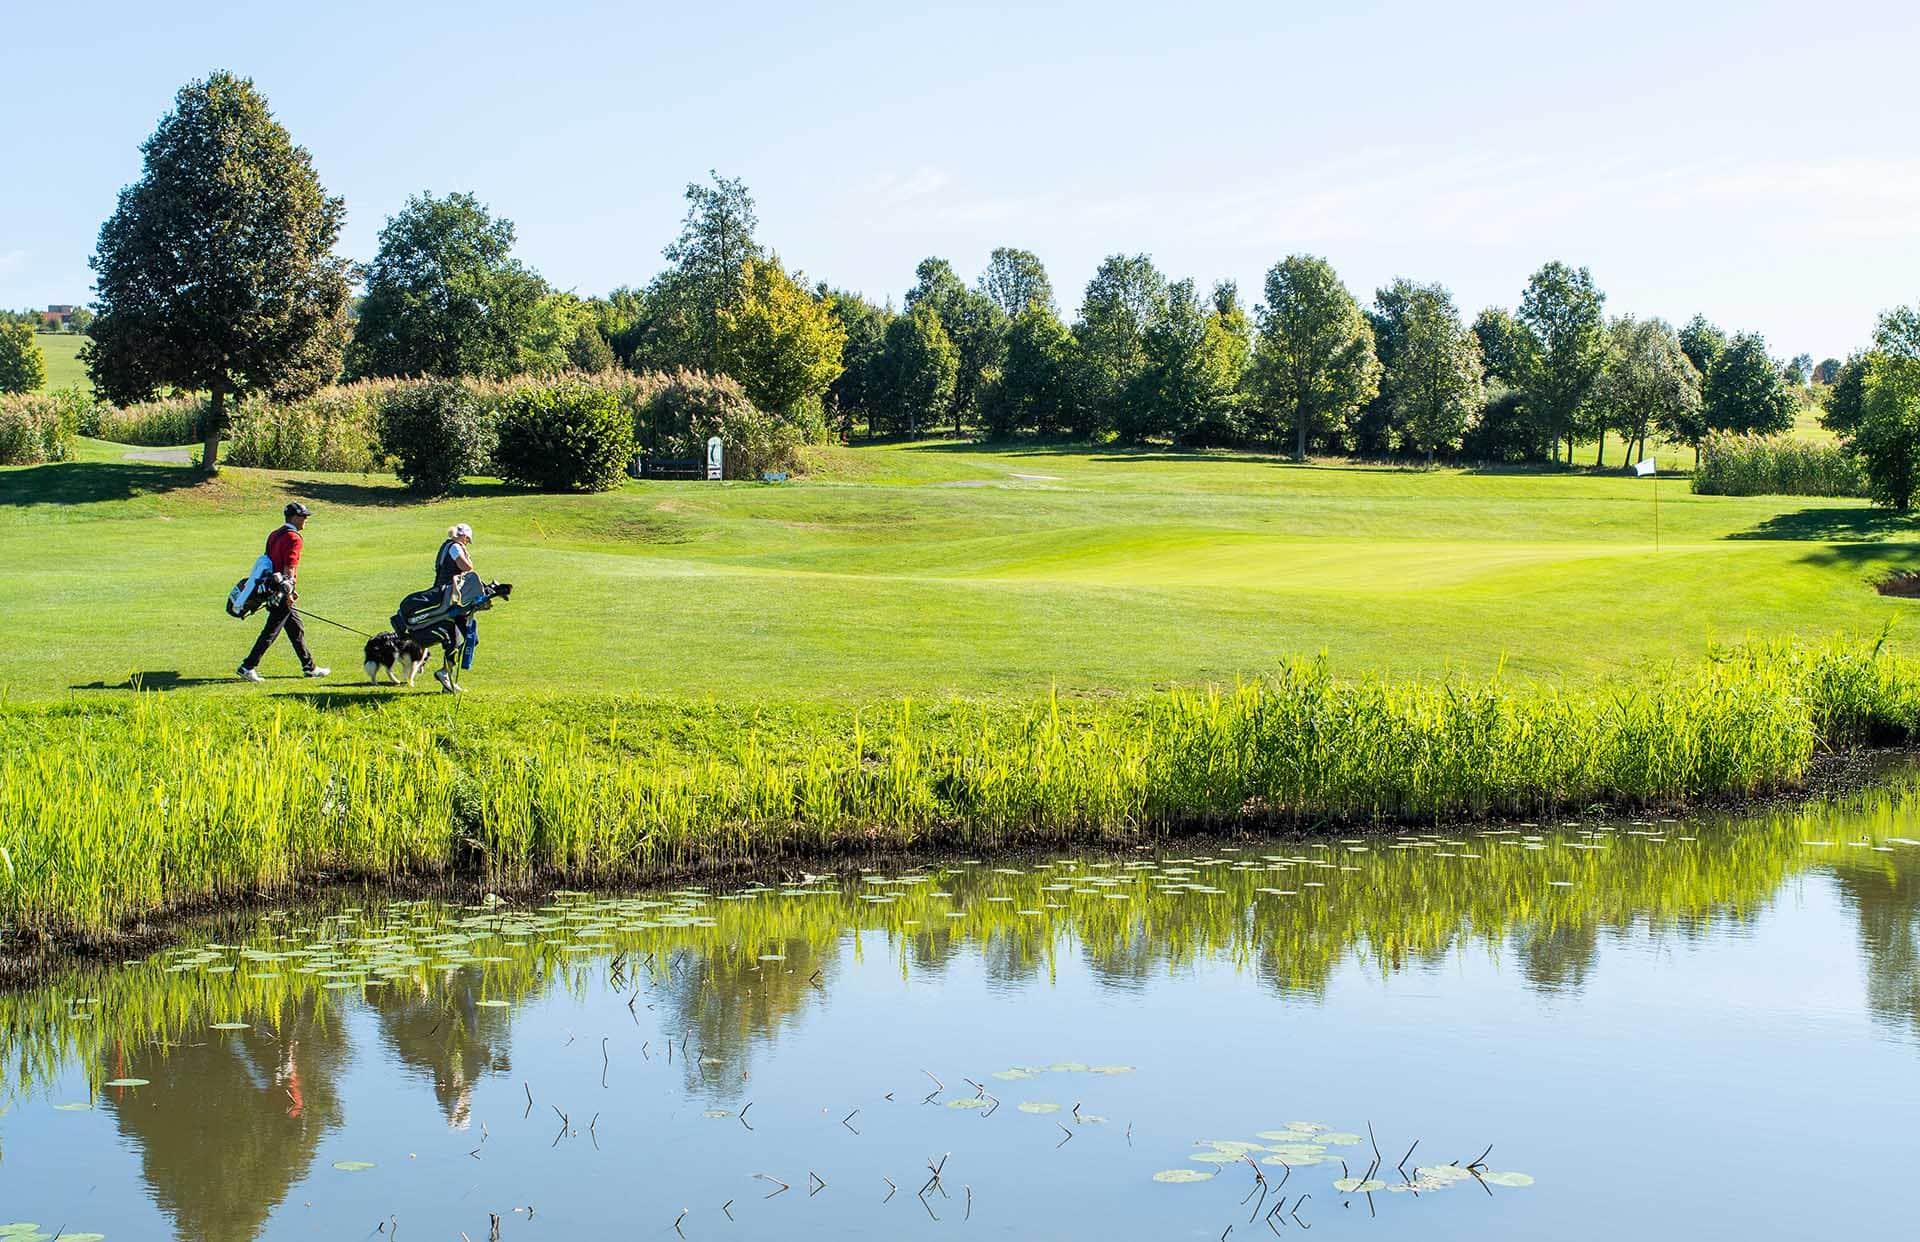 Reiters Golfplatz Bad Tatzmannsdorf